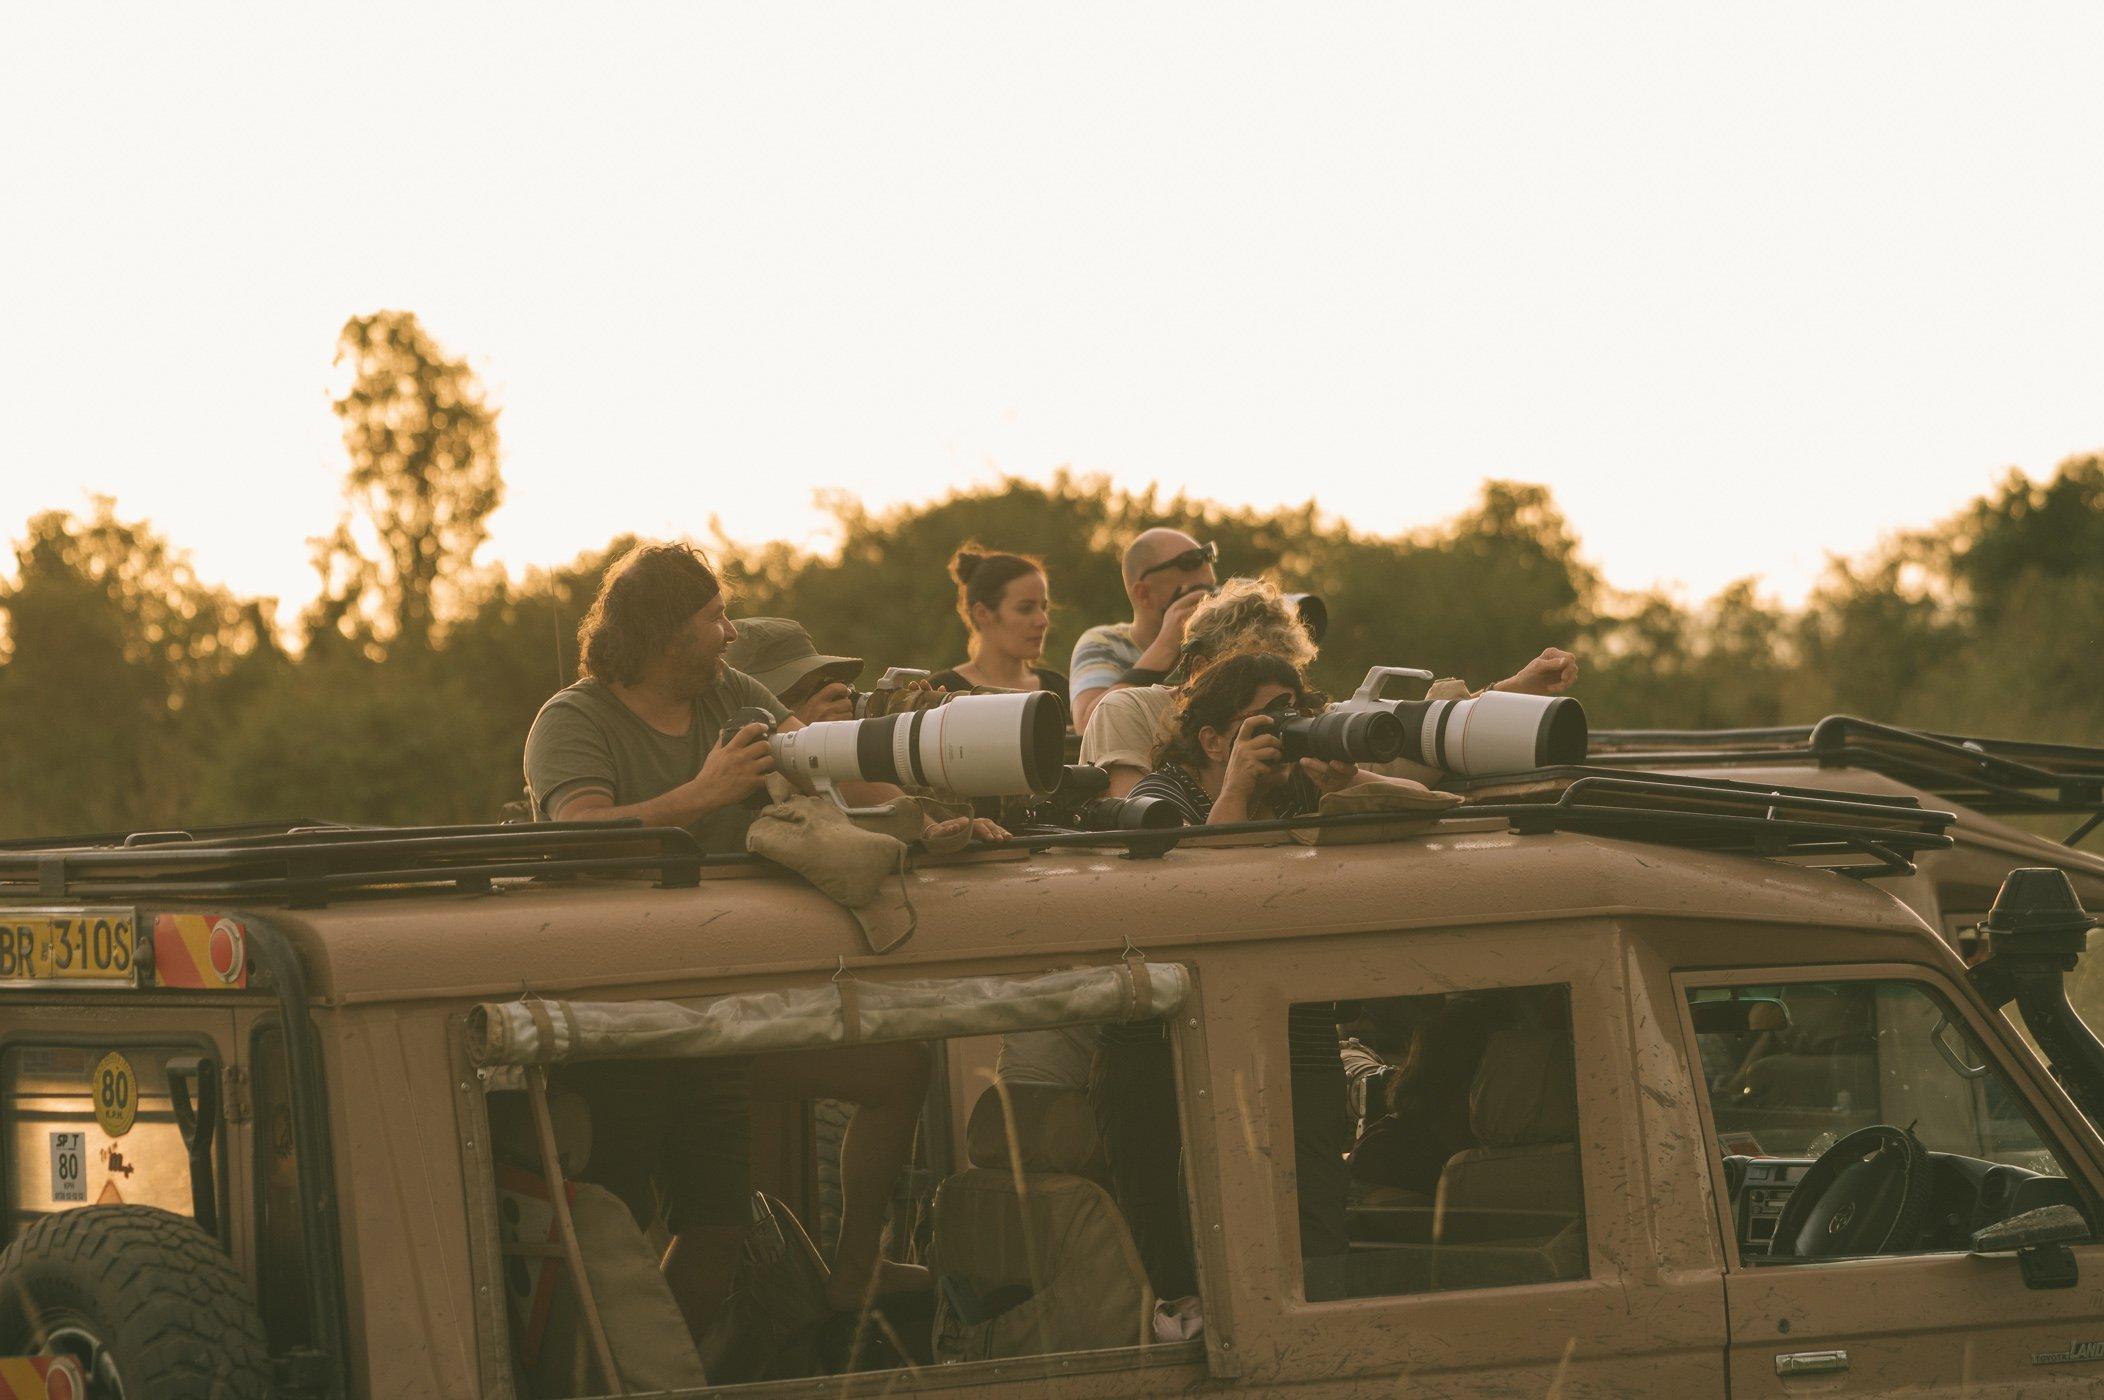 Safari vehicle in the Maasai Mara in Kenya